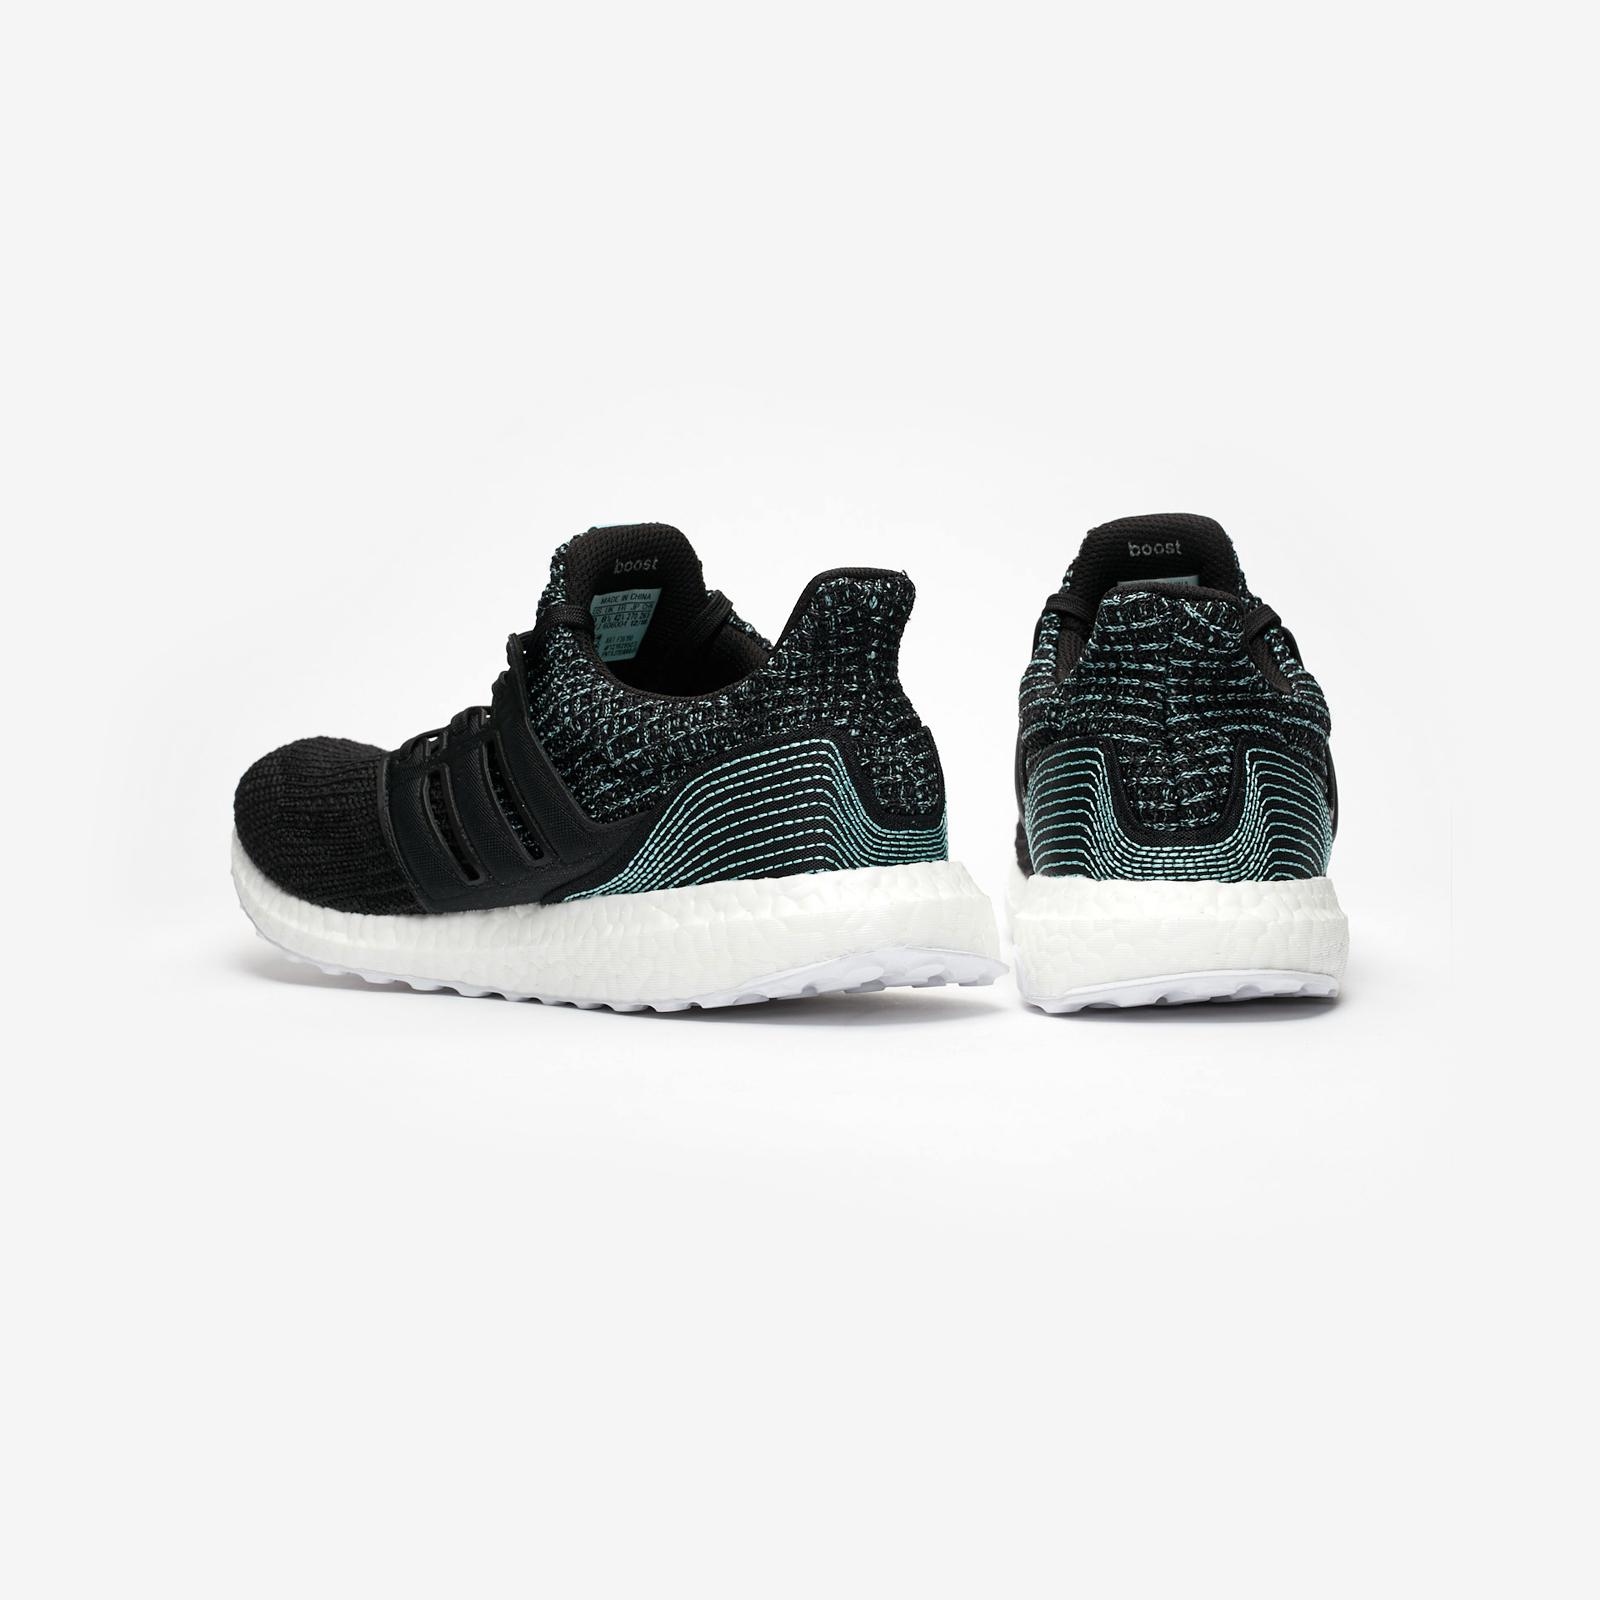 newest 43832 5d798 adidas Ultraboost Parley - F36190 - Sneakersnstuff ...